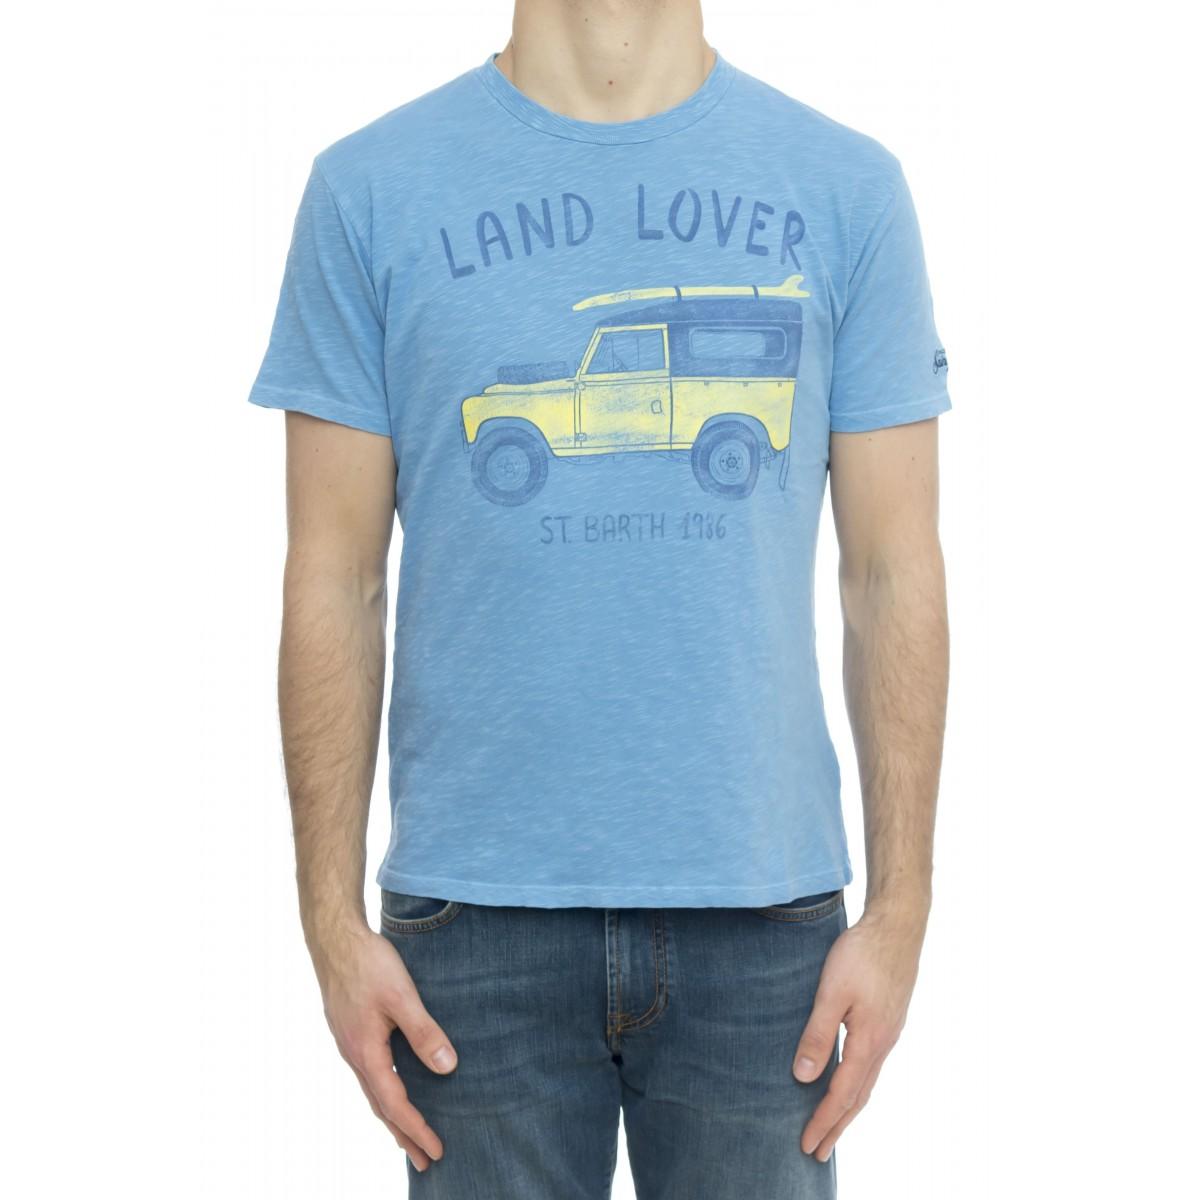 T-shirt - Skylar barth lover